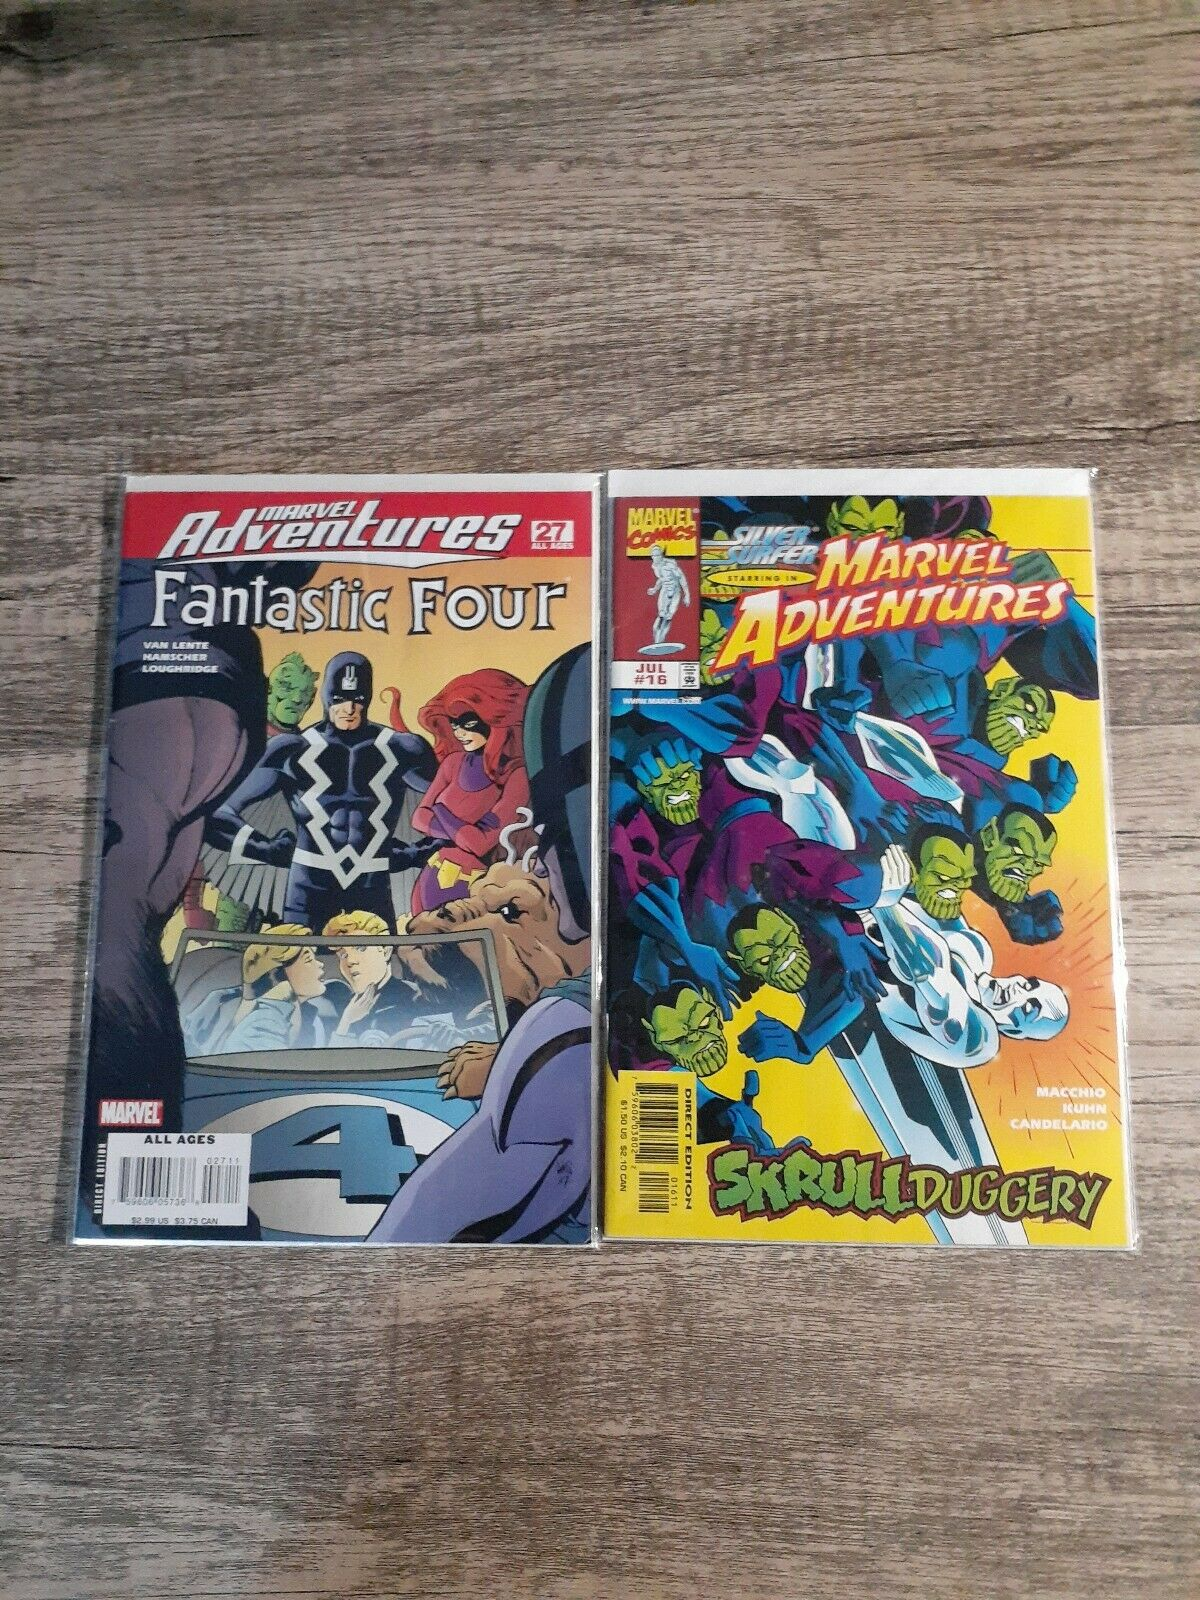 Fantastic Four #554 Coliseum of Comics Exclusive Arthur Suydam Skrull Variant